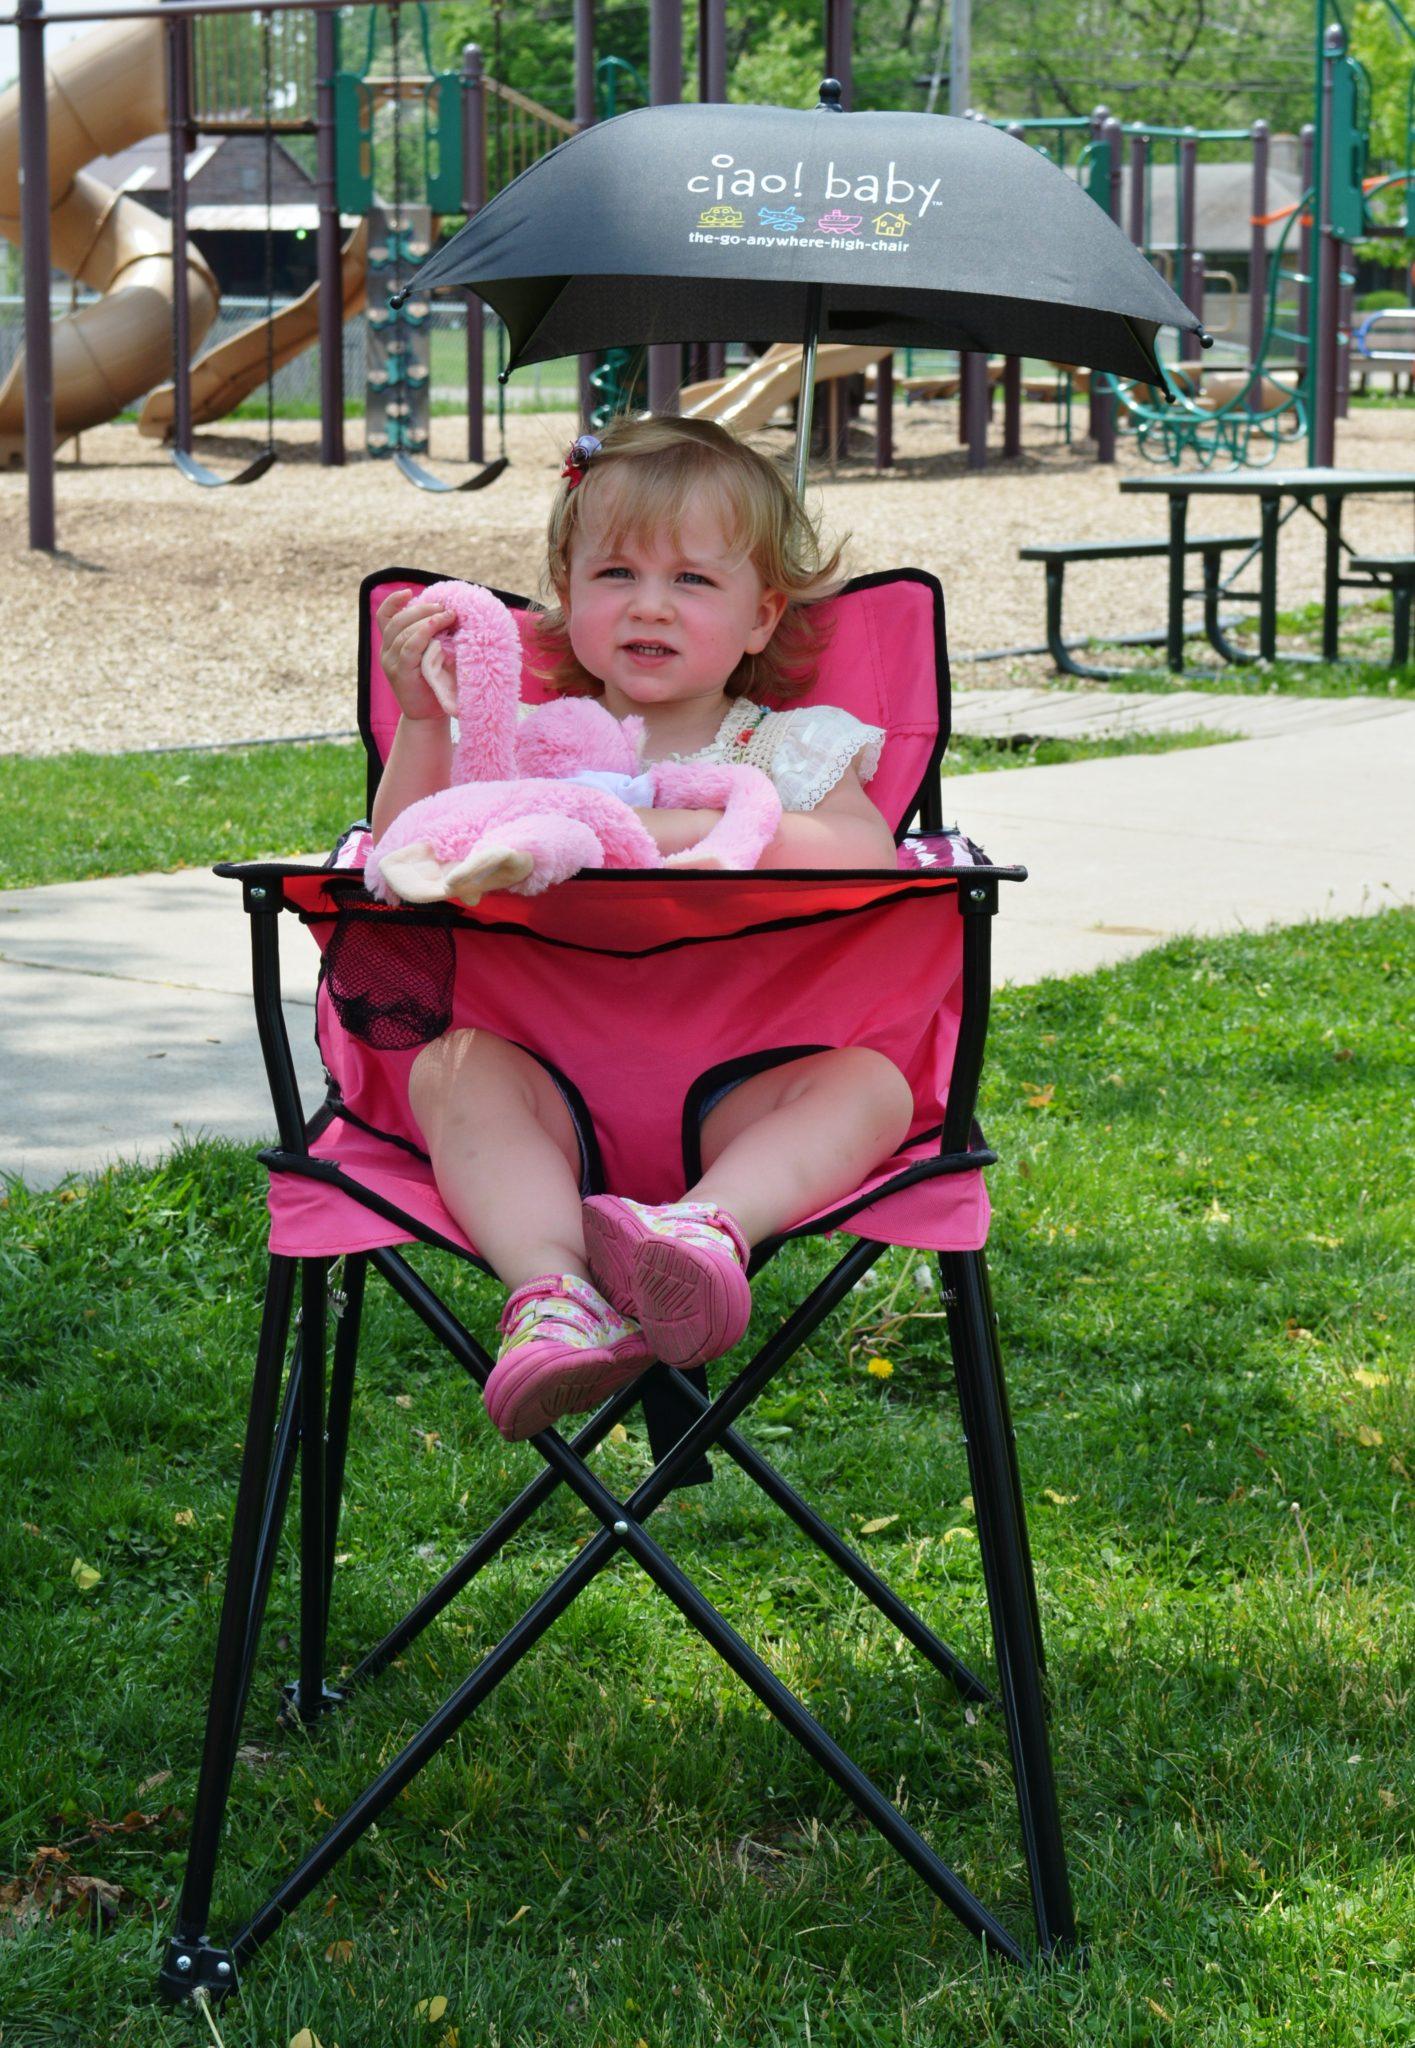 Introducing Ciao Baby Umbrella The Portable High Chair